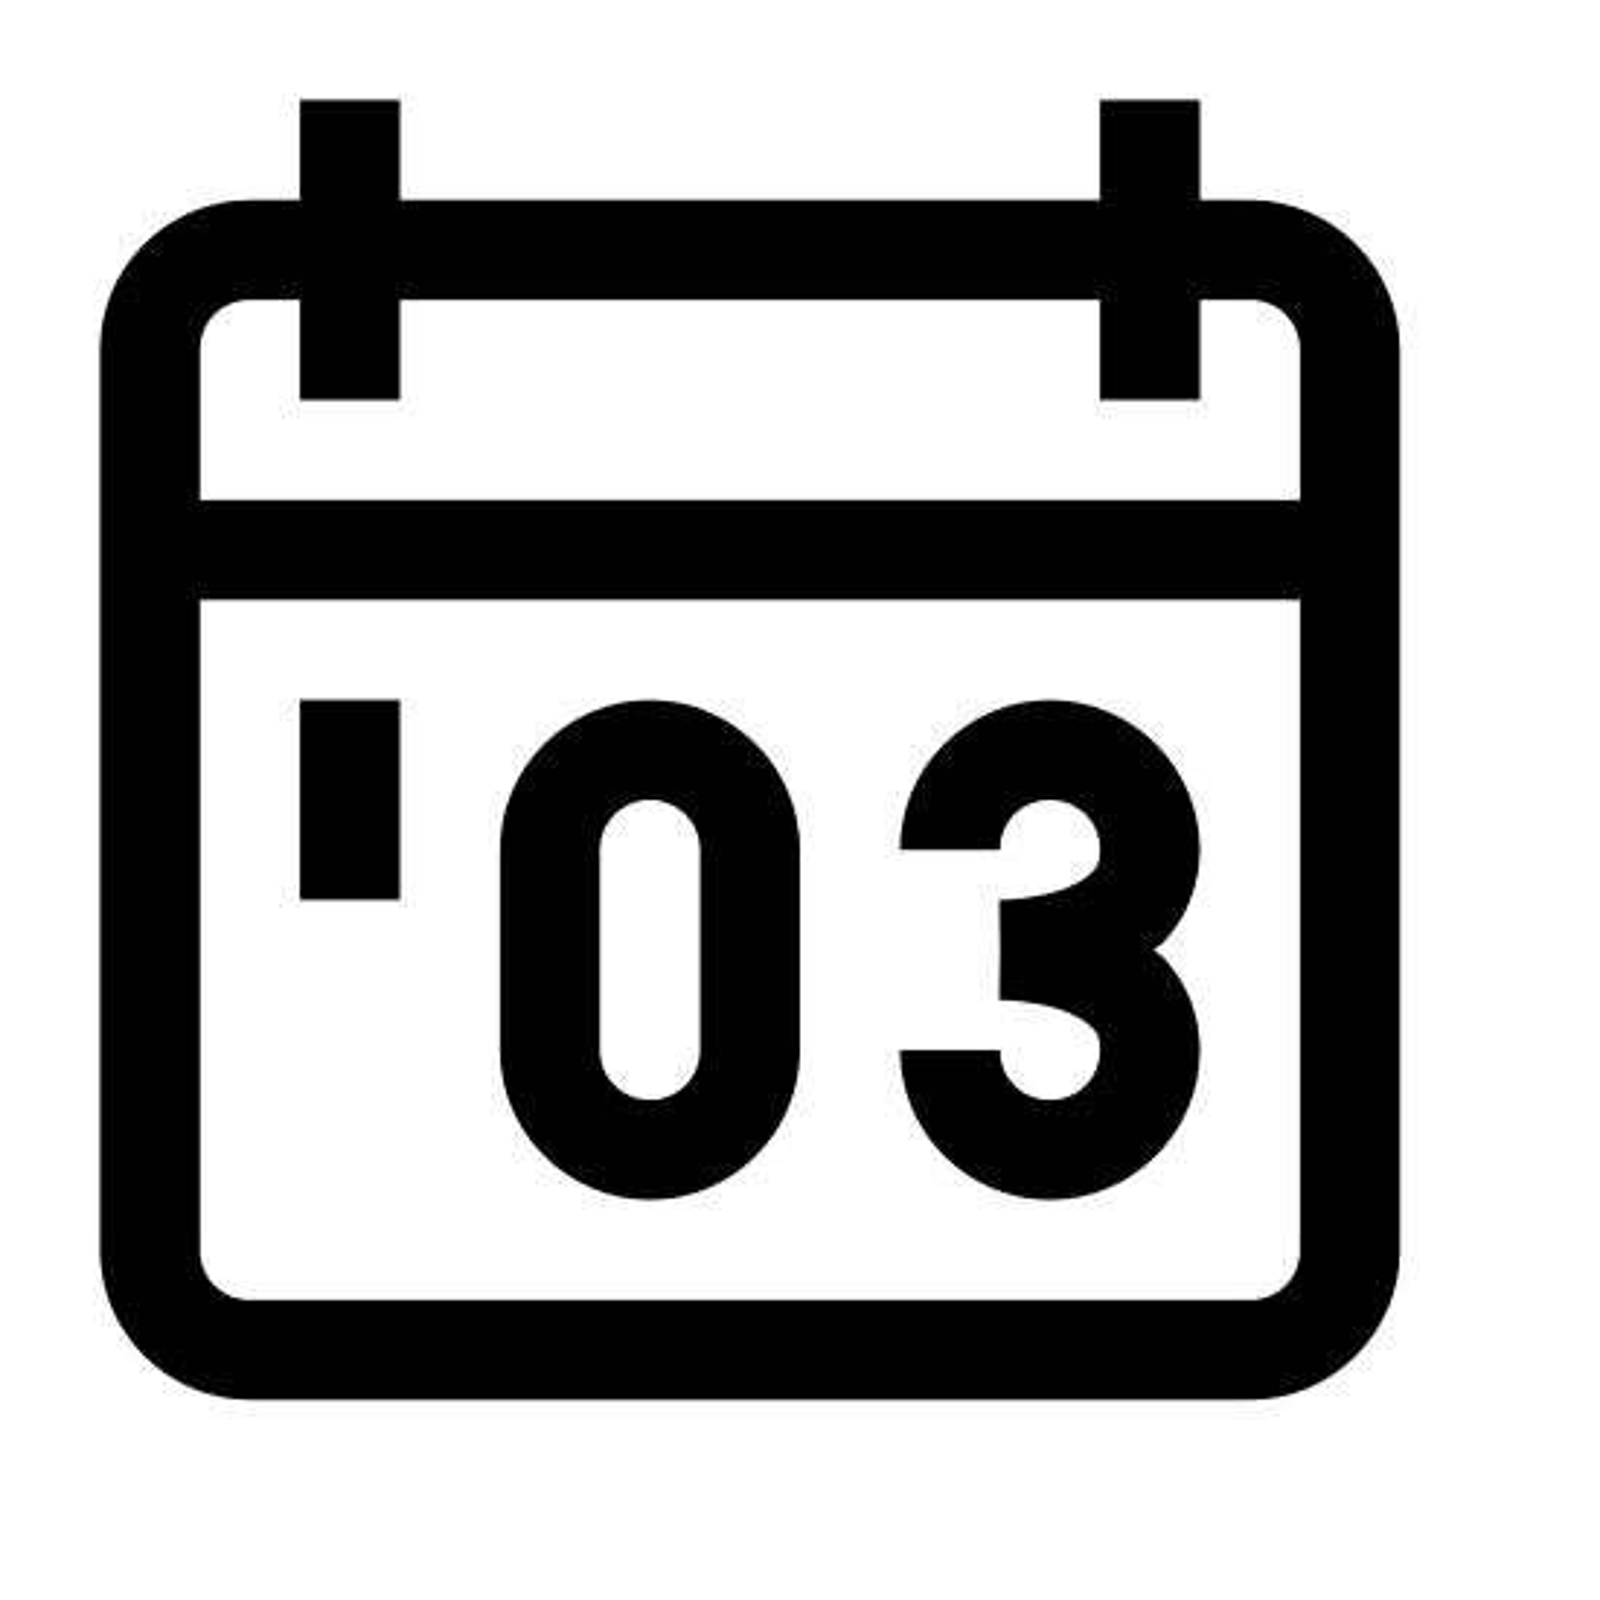 2003 icon